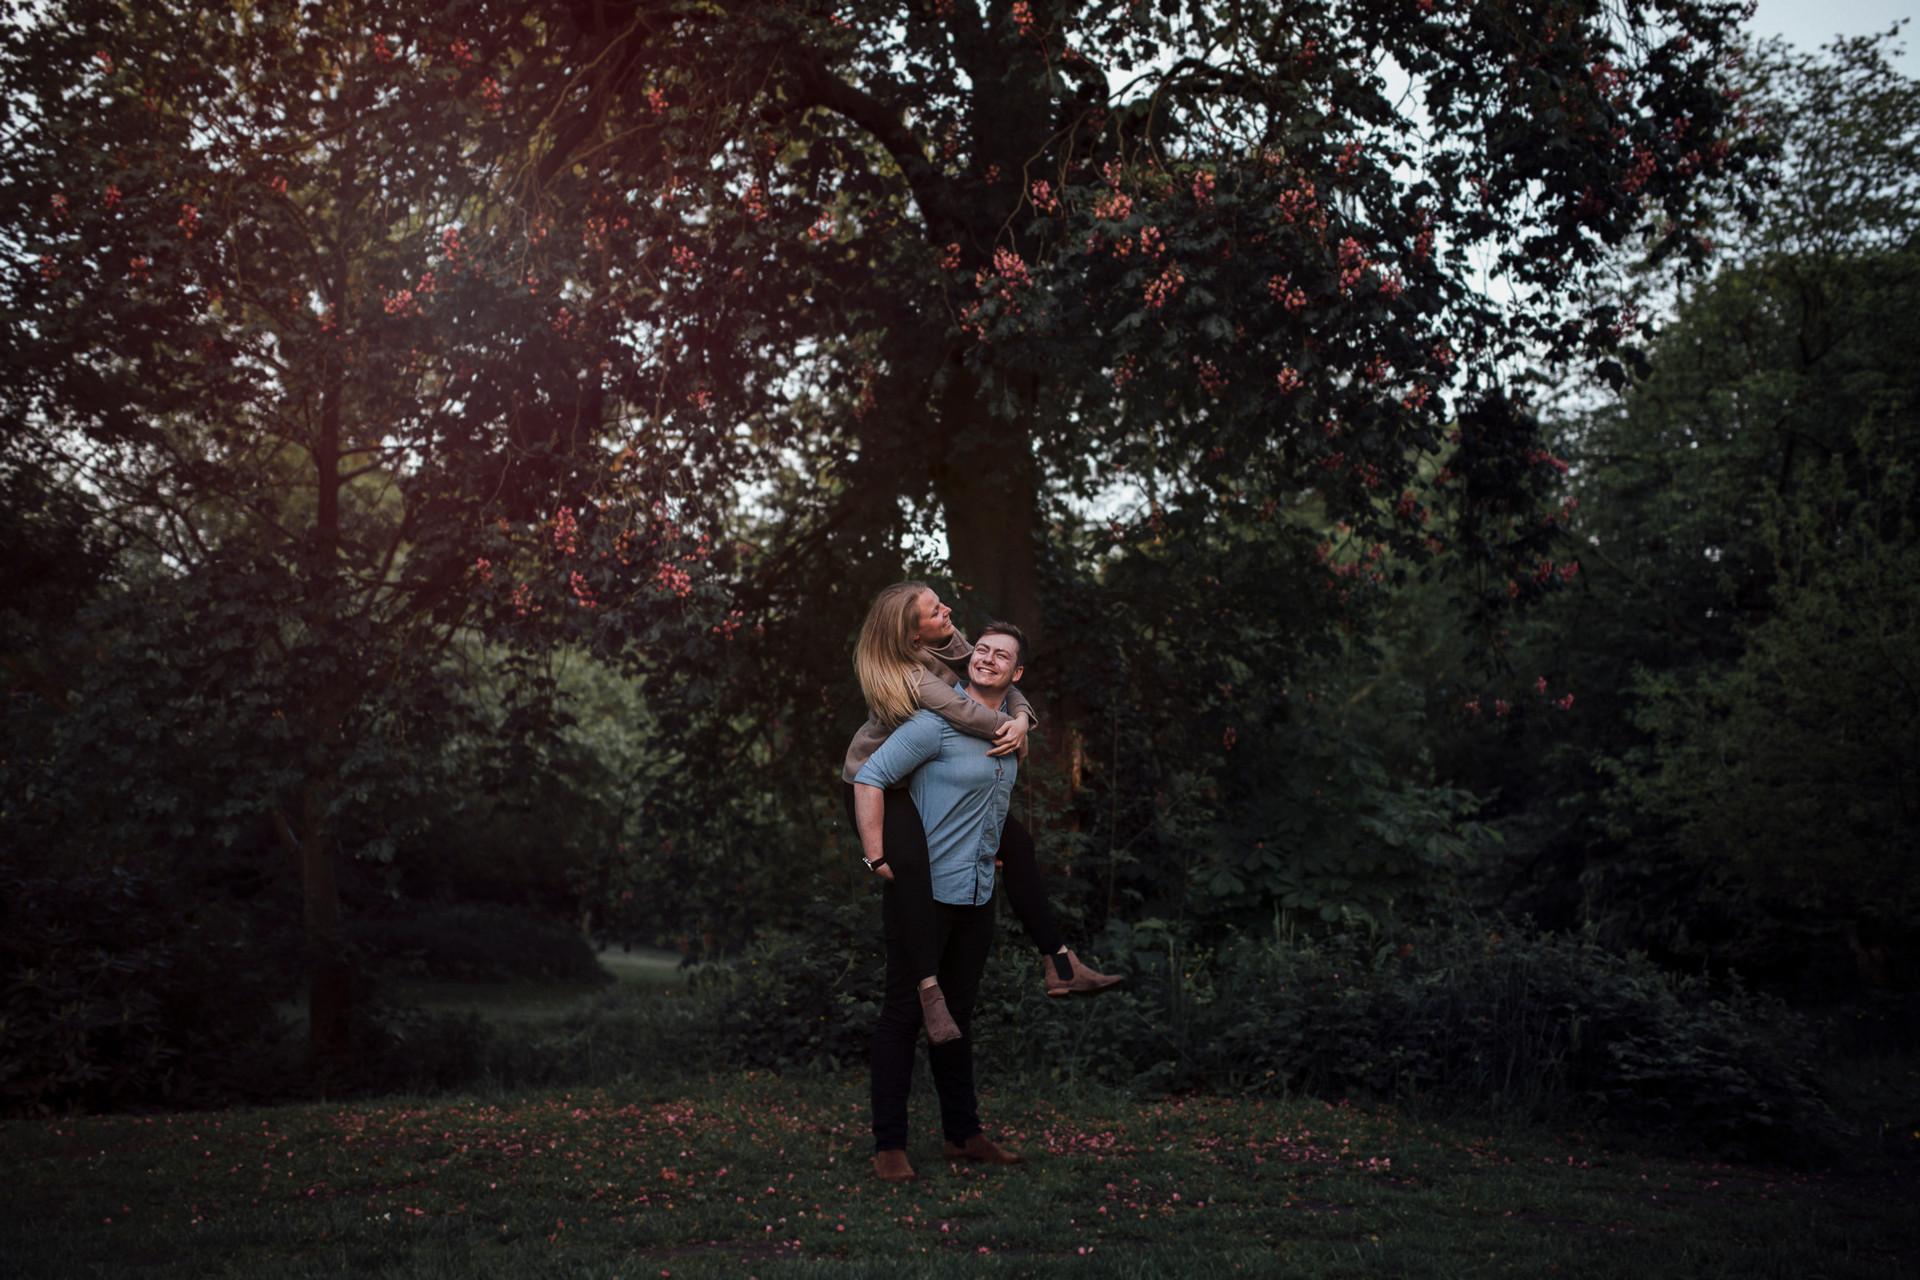 leeds photoshoot middleton park